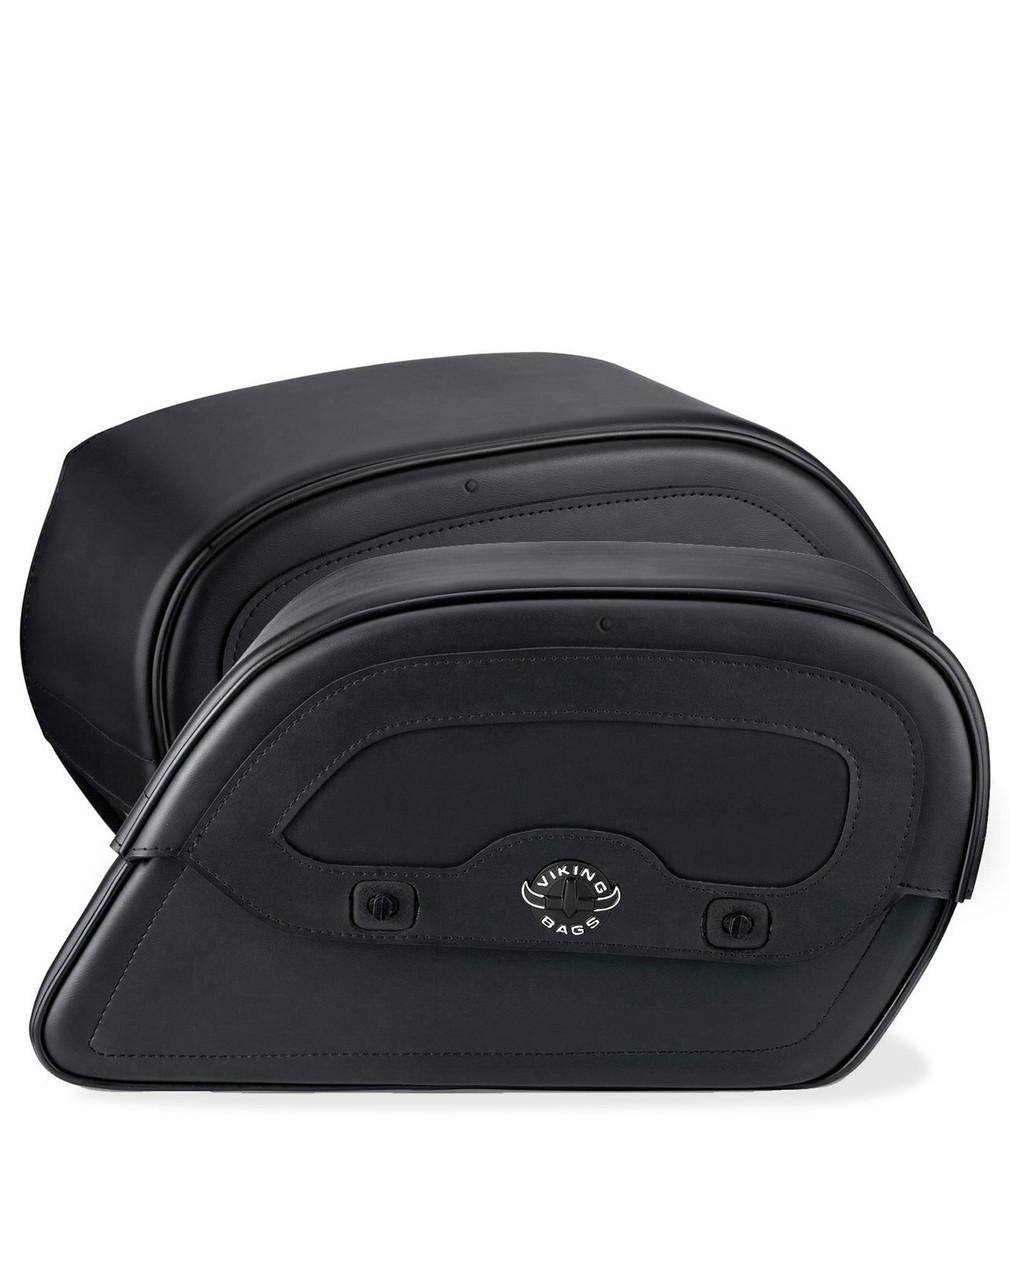 Honda 1500 Valkyrie Standard Uni Warrior Slanted M Motorcycle saddlebags Both Bags View